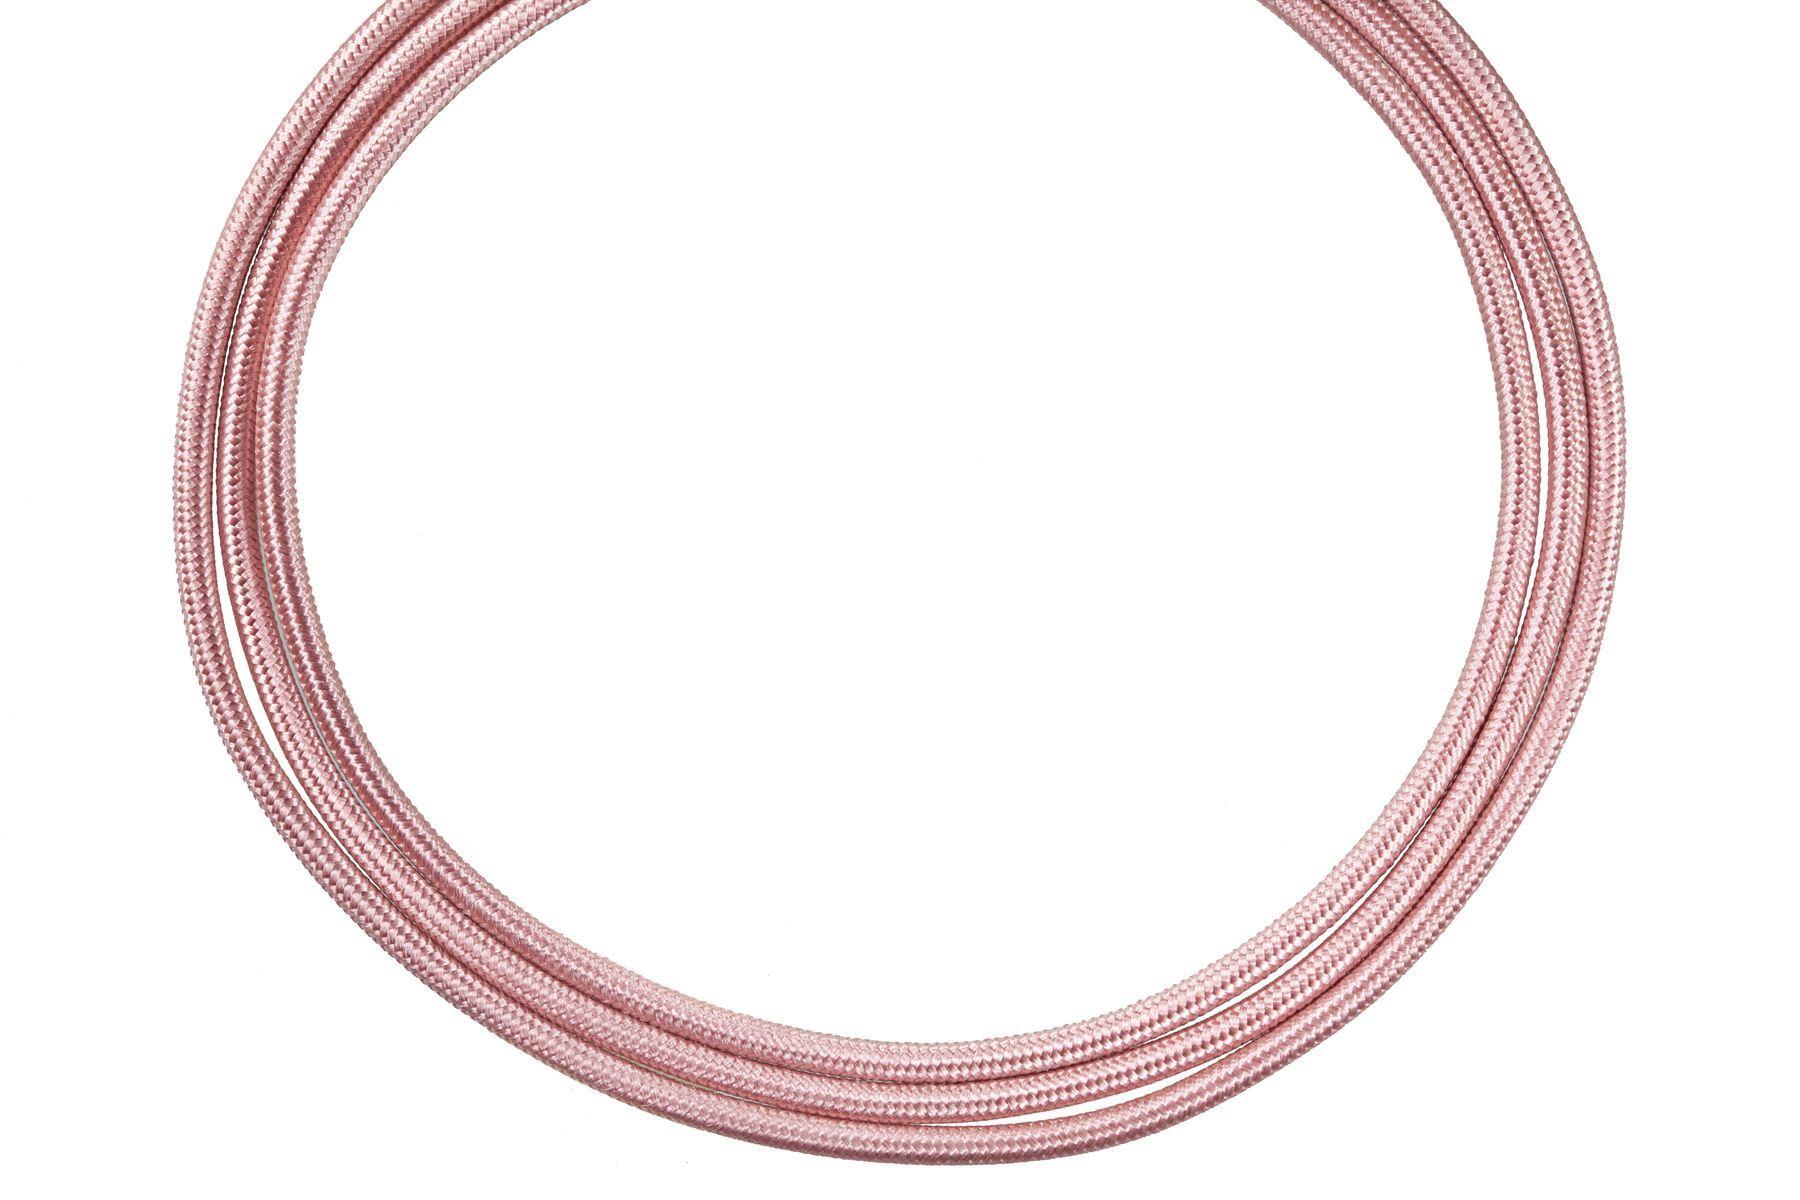 Aluminium Series 2-in-1 Lightning Cable (Rose Gold)